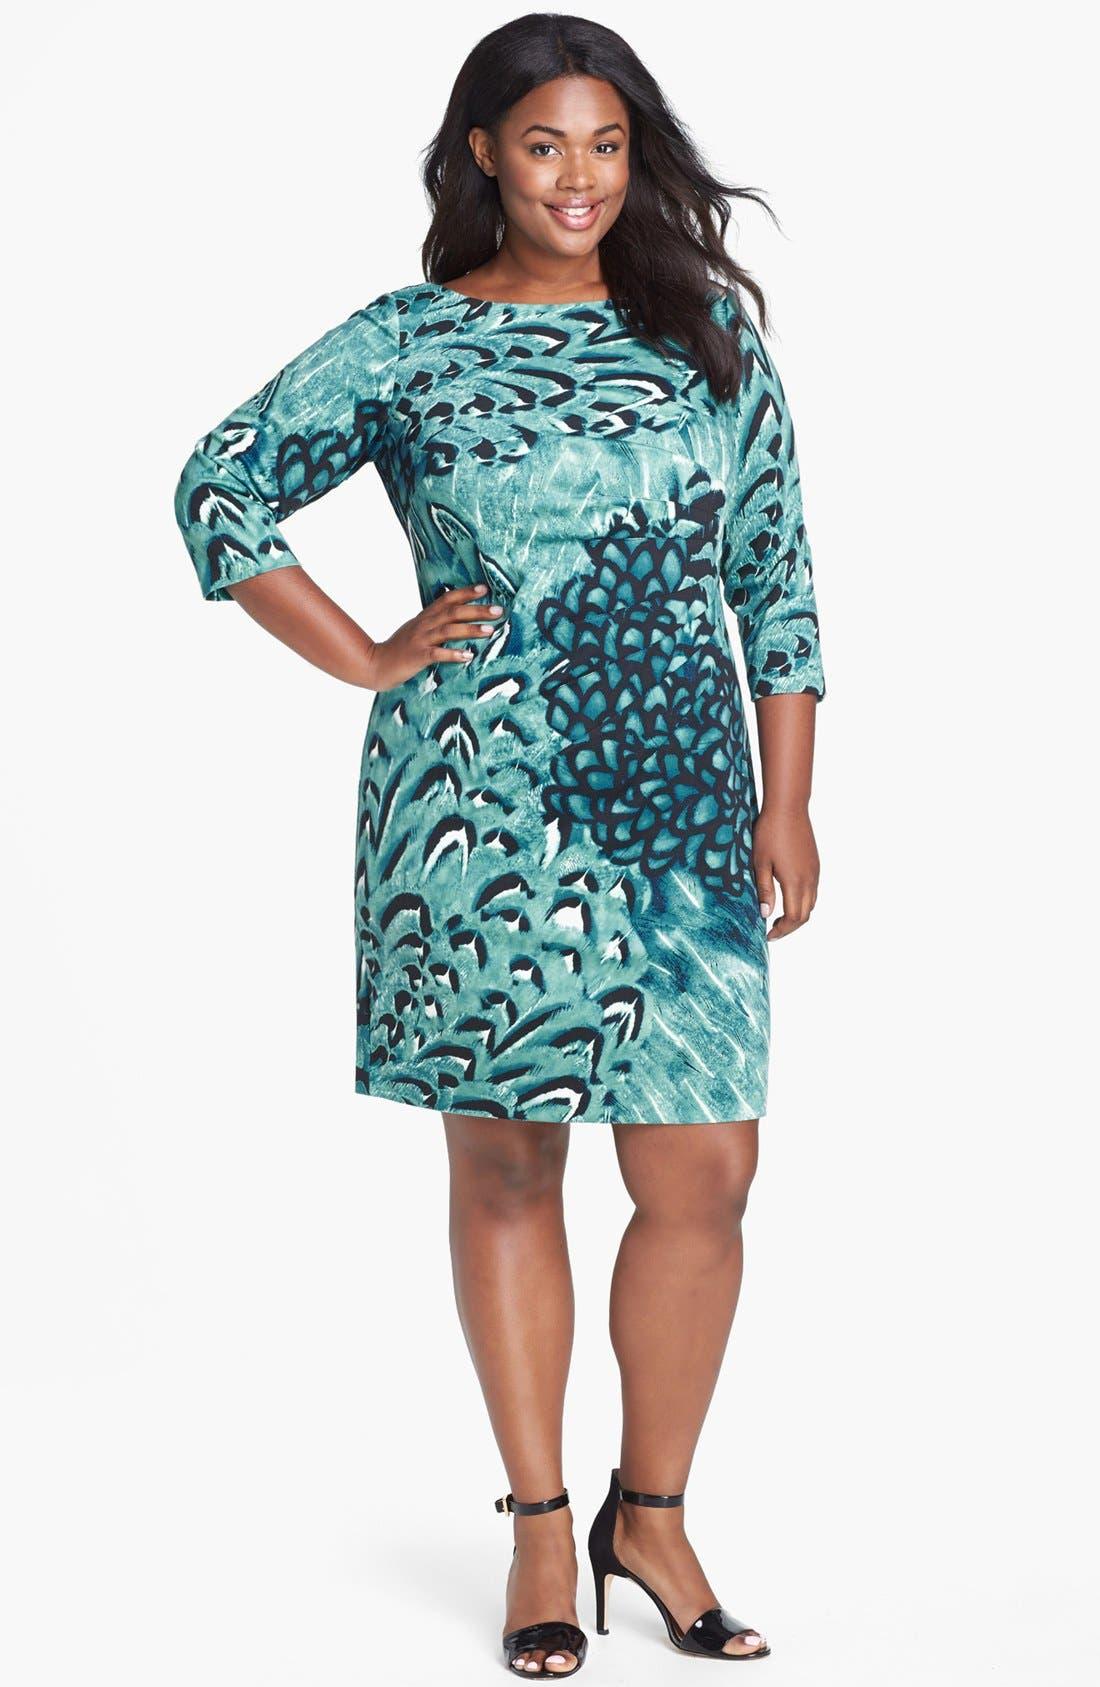 Alternate Image 1 Selected - Jessica Simpson Print Side Pleat Sheath Dress (Plus Size)